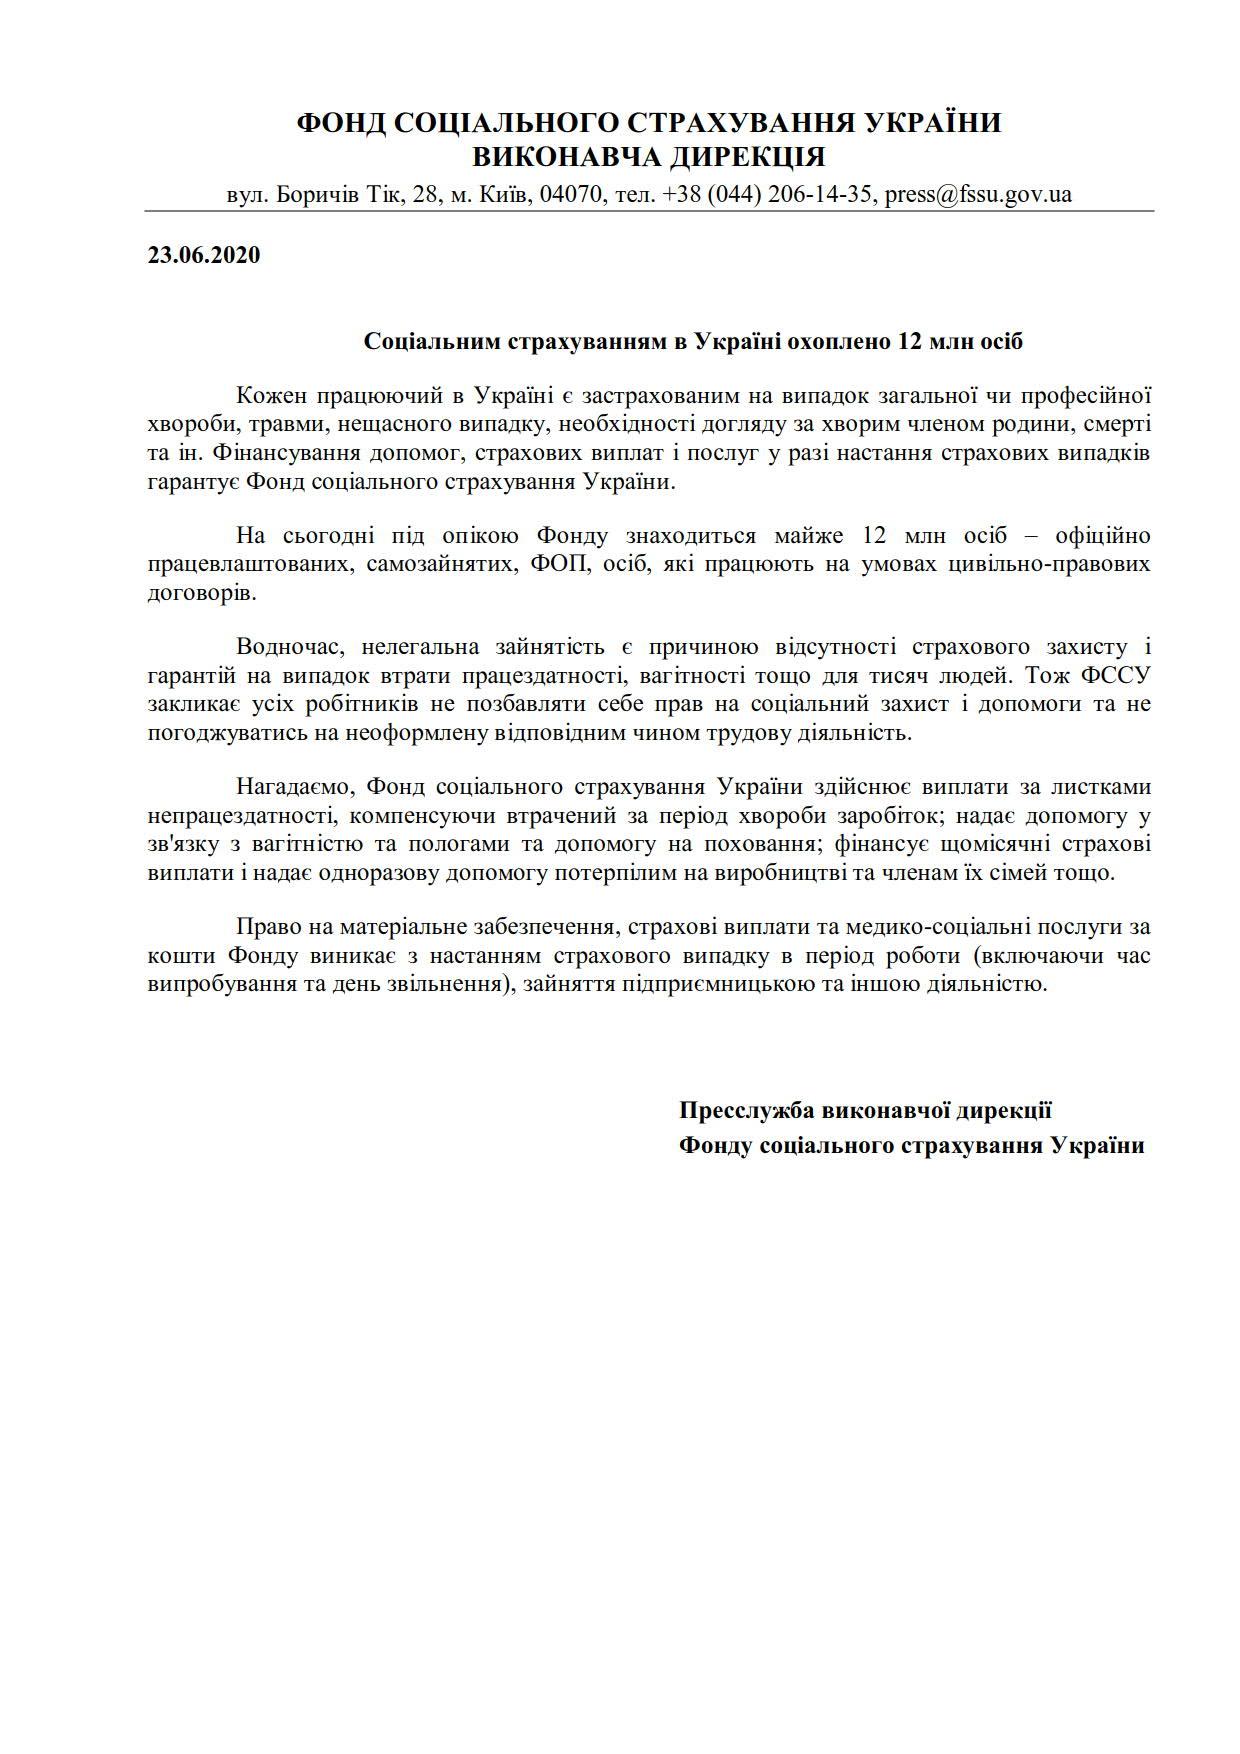 ФССУ_незадекларована праця_1